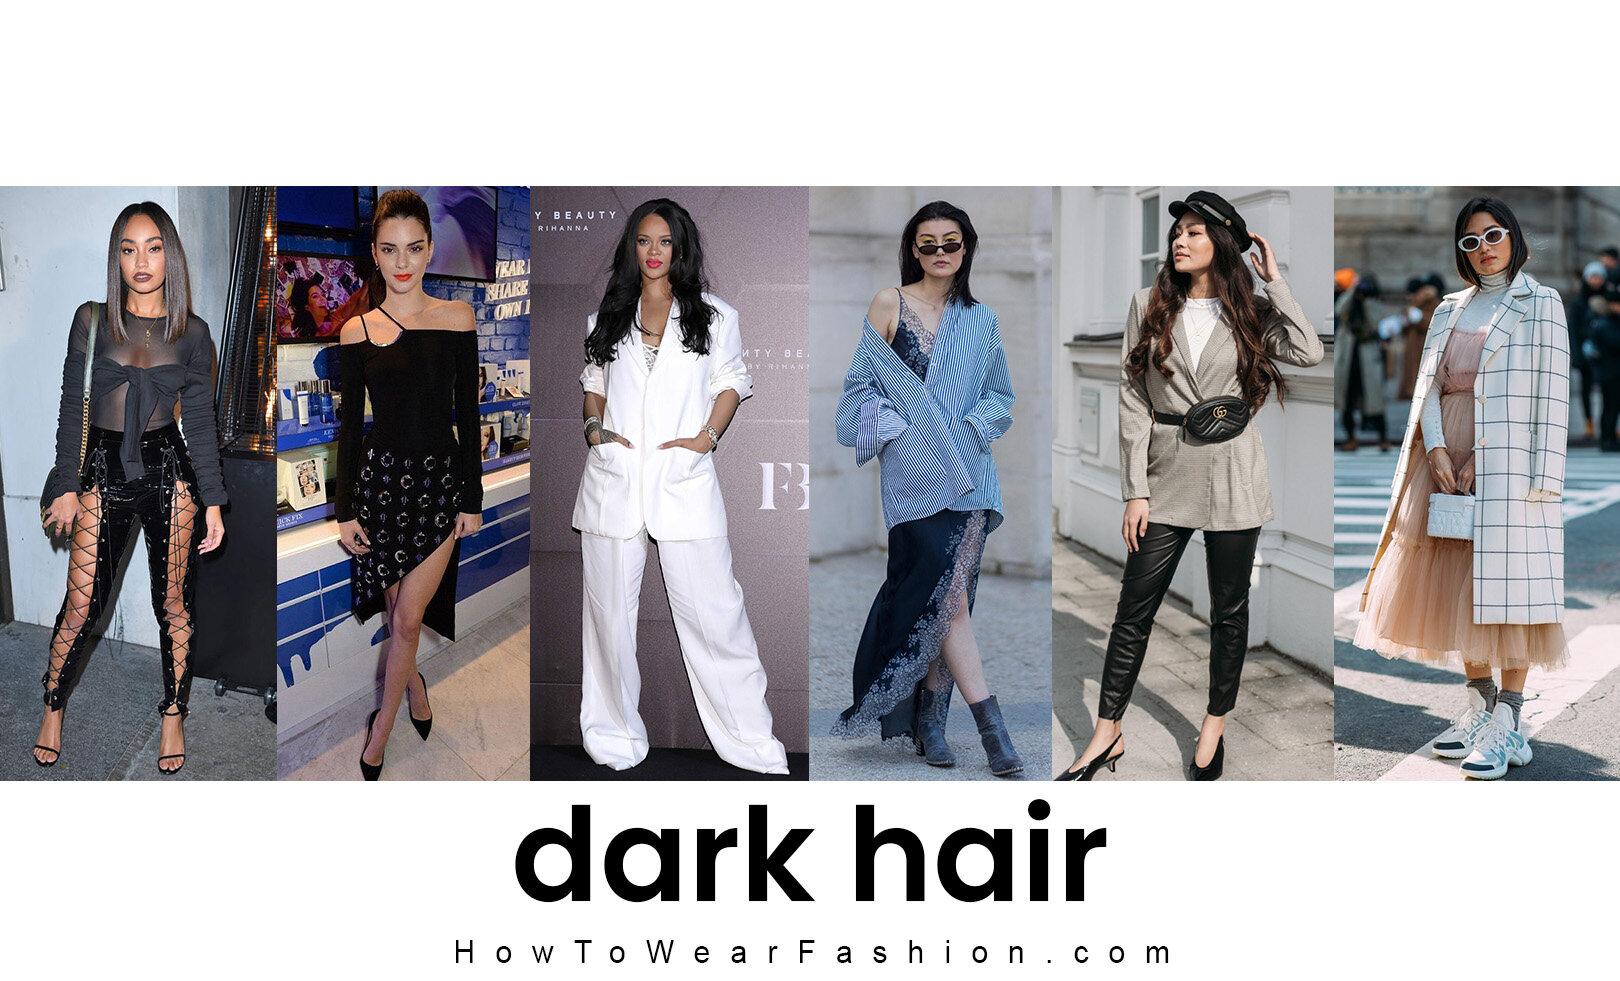 What To Wear With Dark Hair Howtowear Fashion